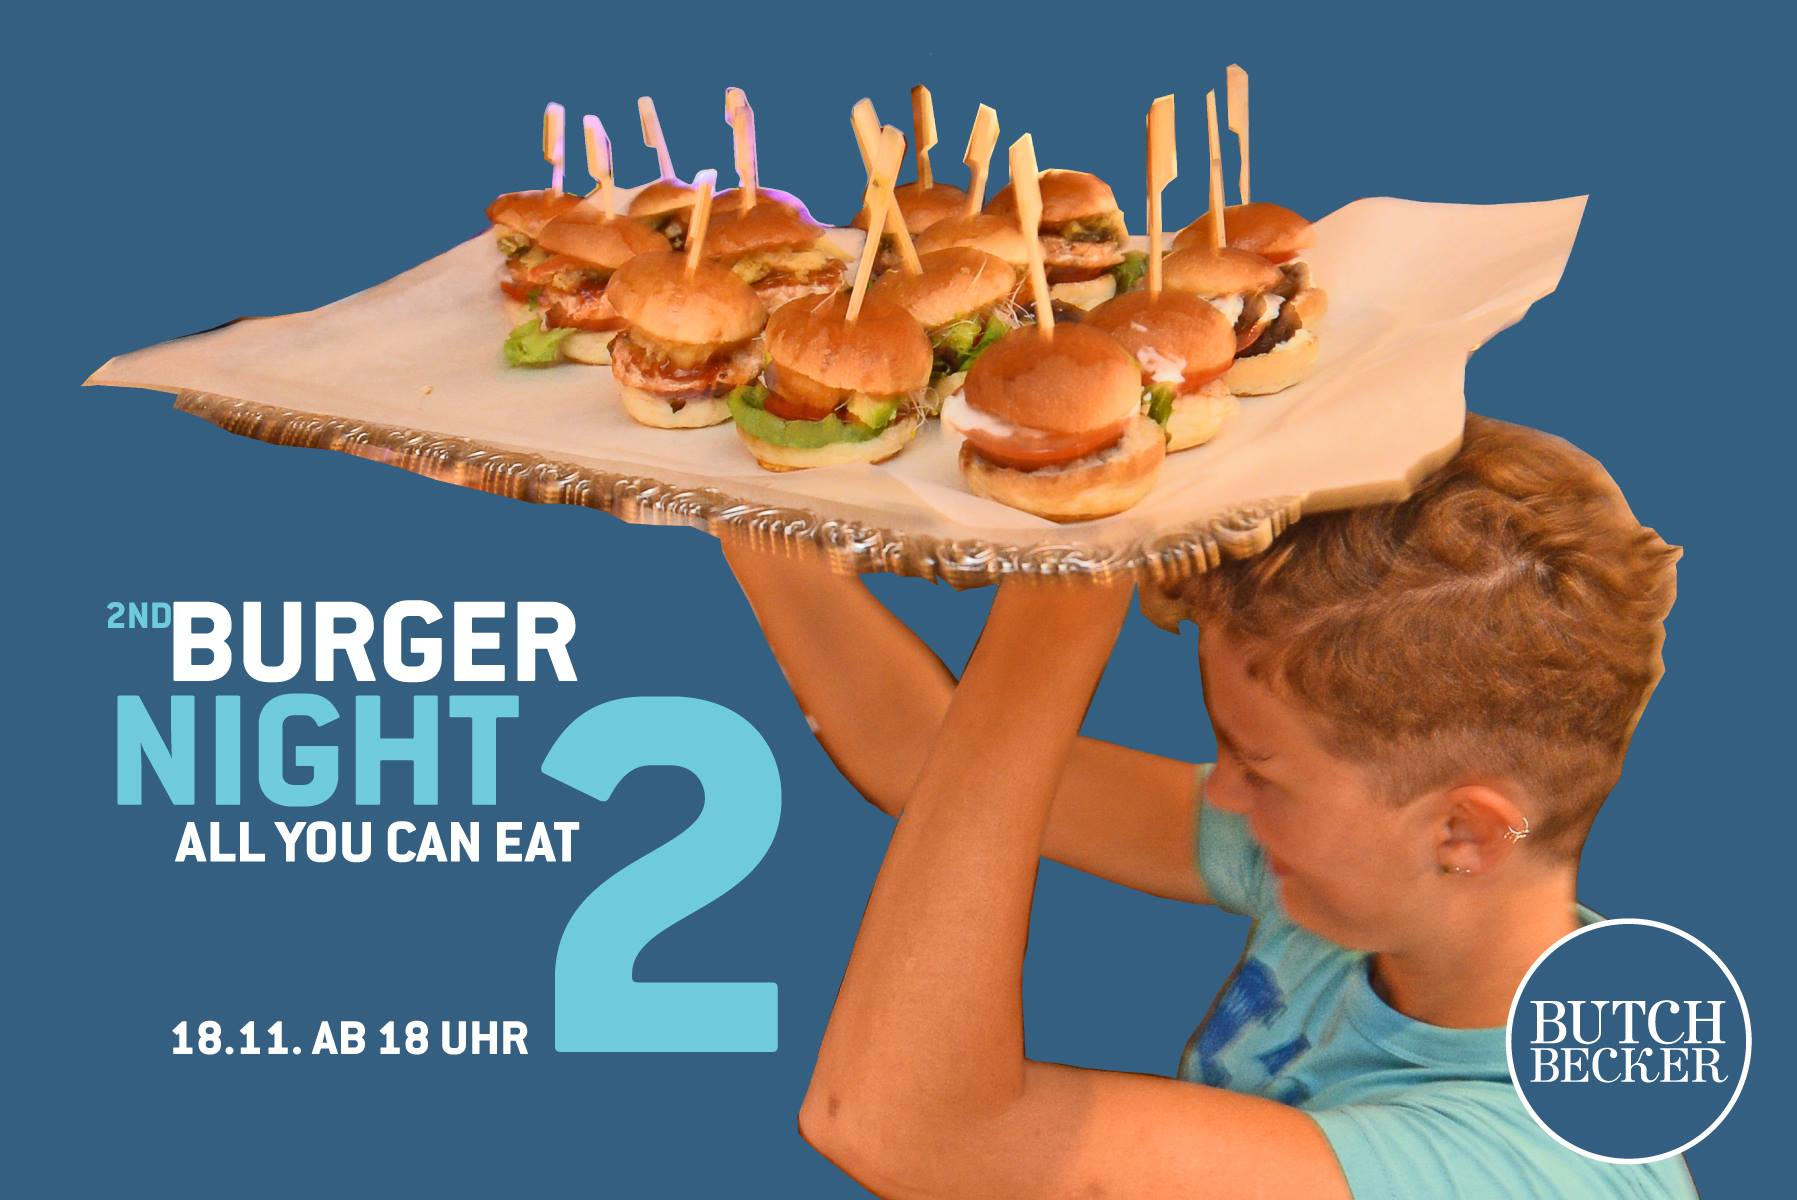 2nd Burger Night 18.11. ab 18:00 Uhr